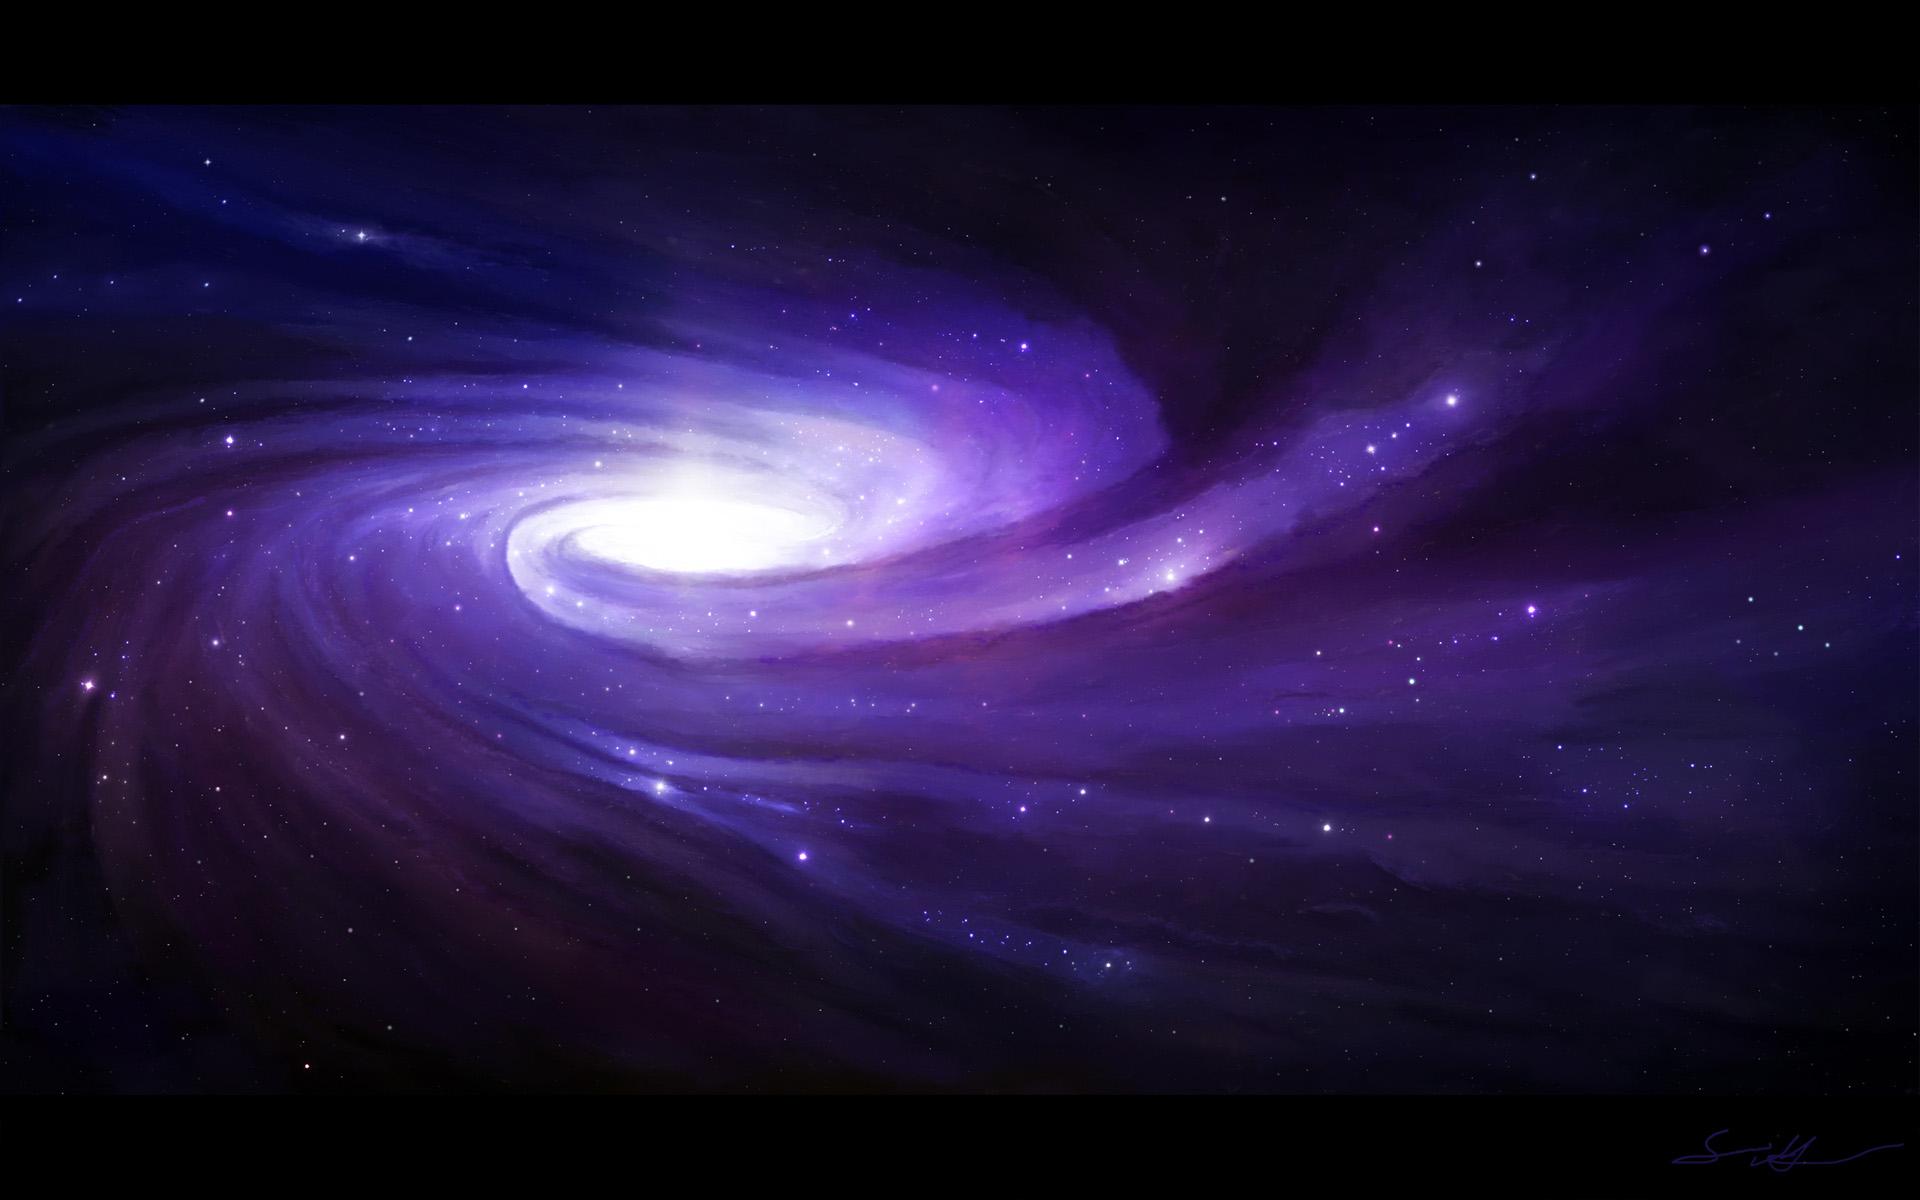 black hole universe creation - photo #19